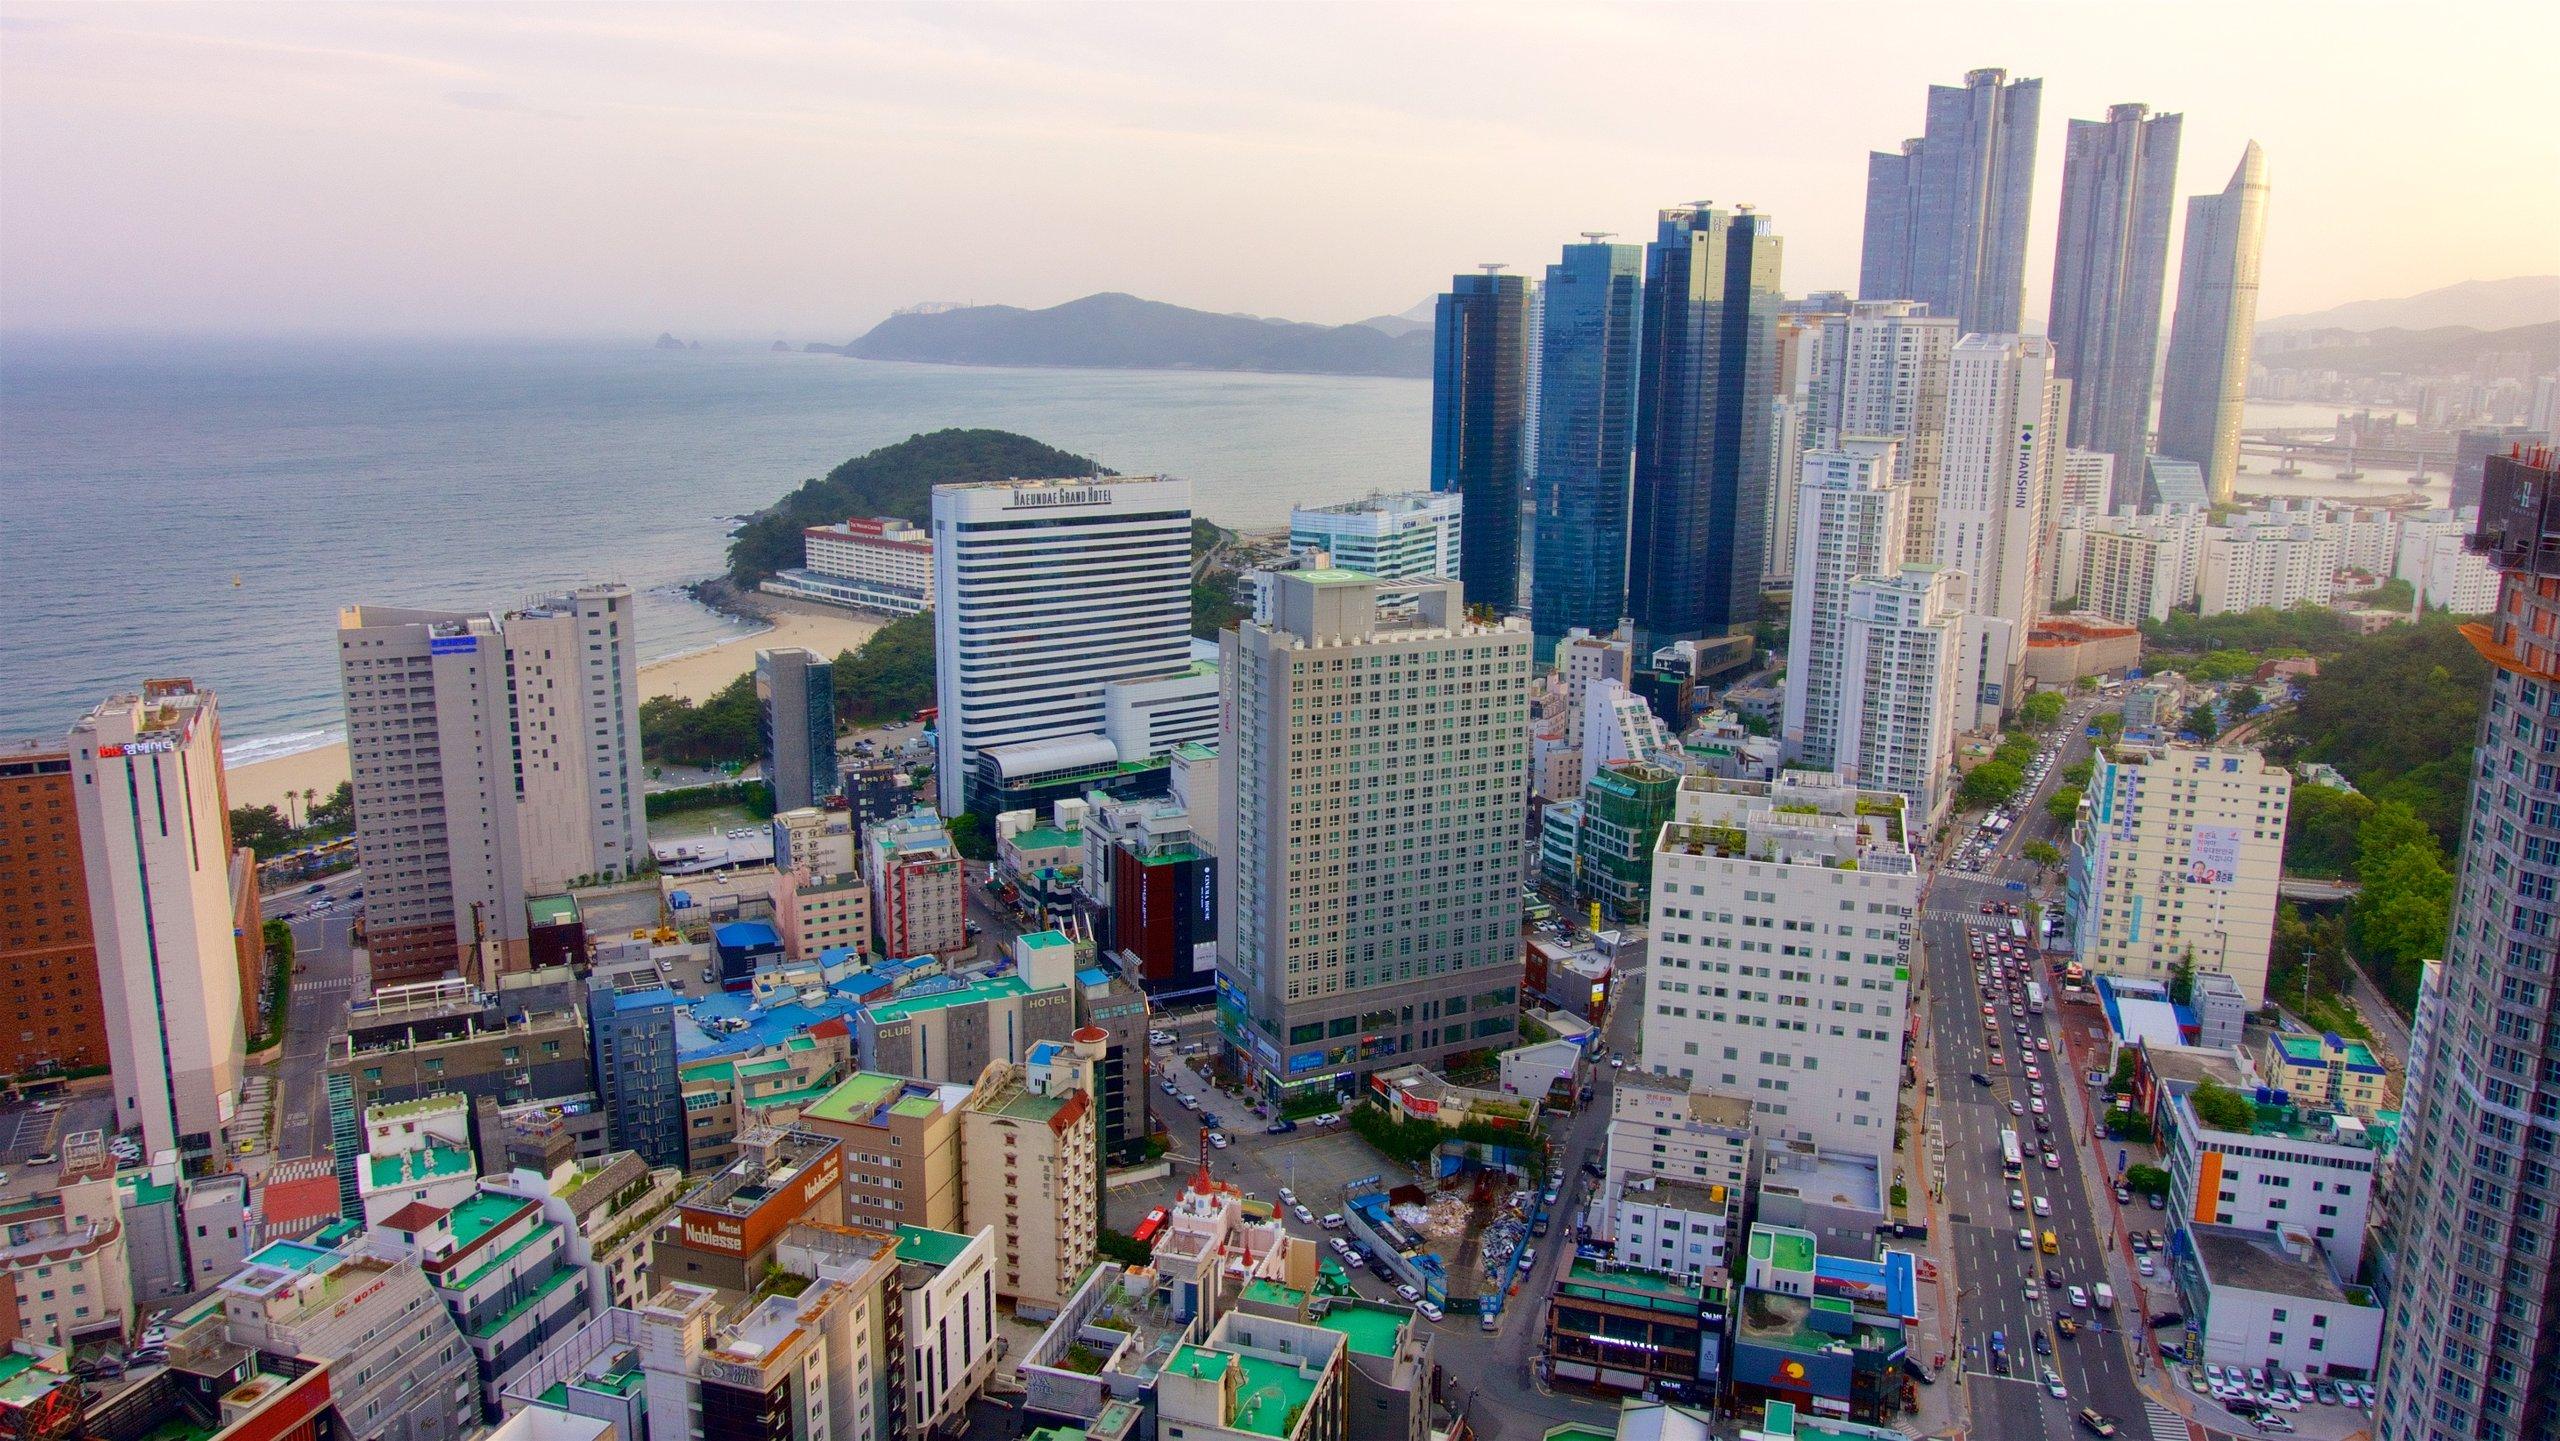 Haeundae, Busan, South Korea